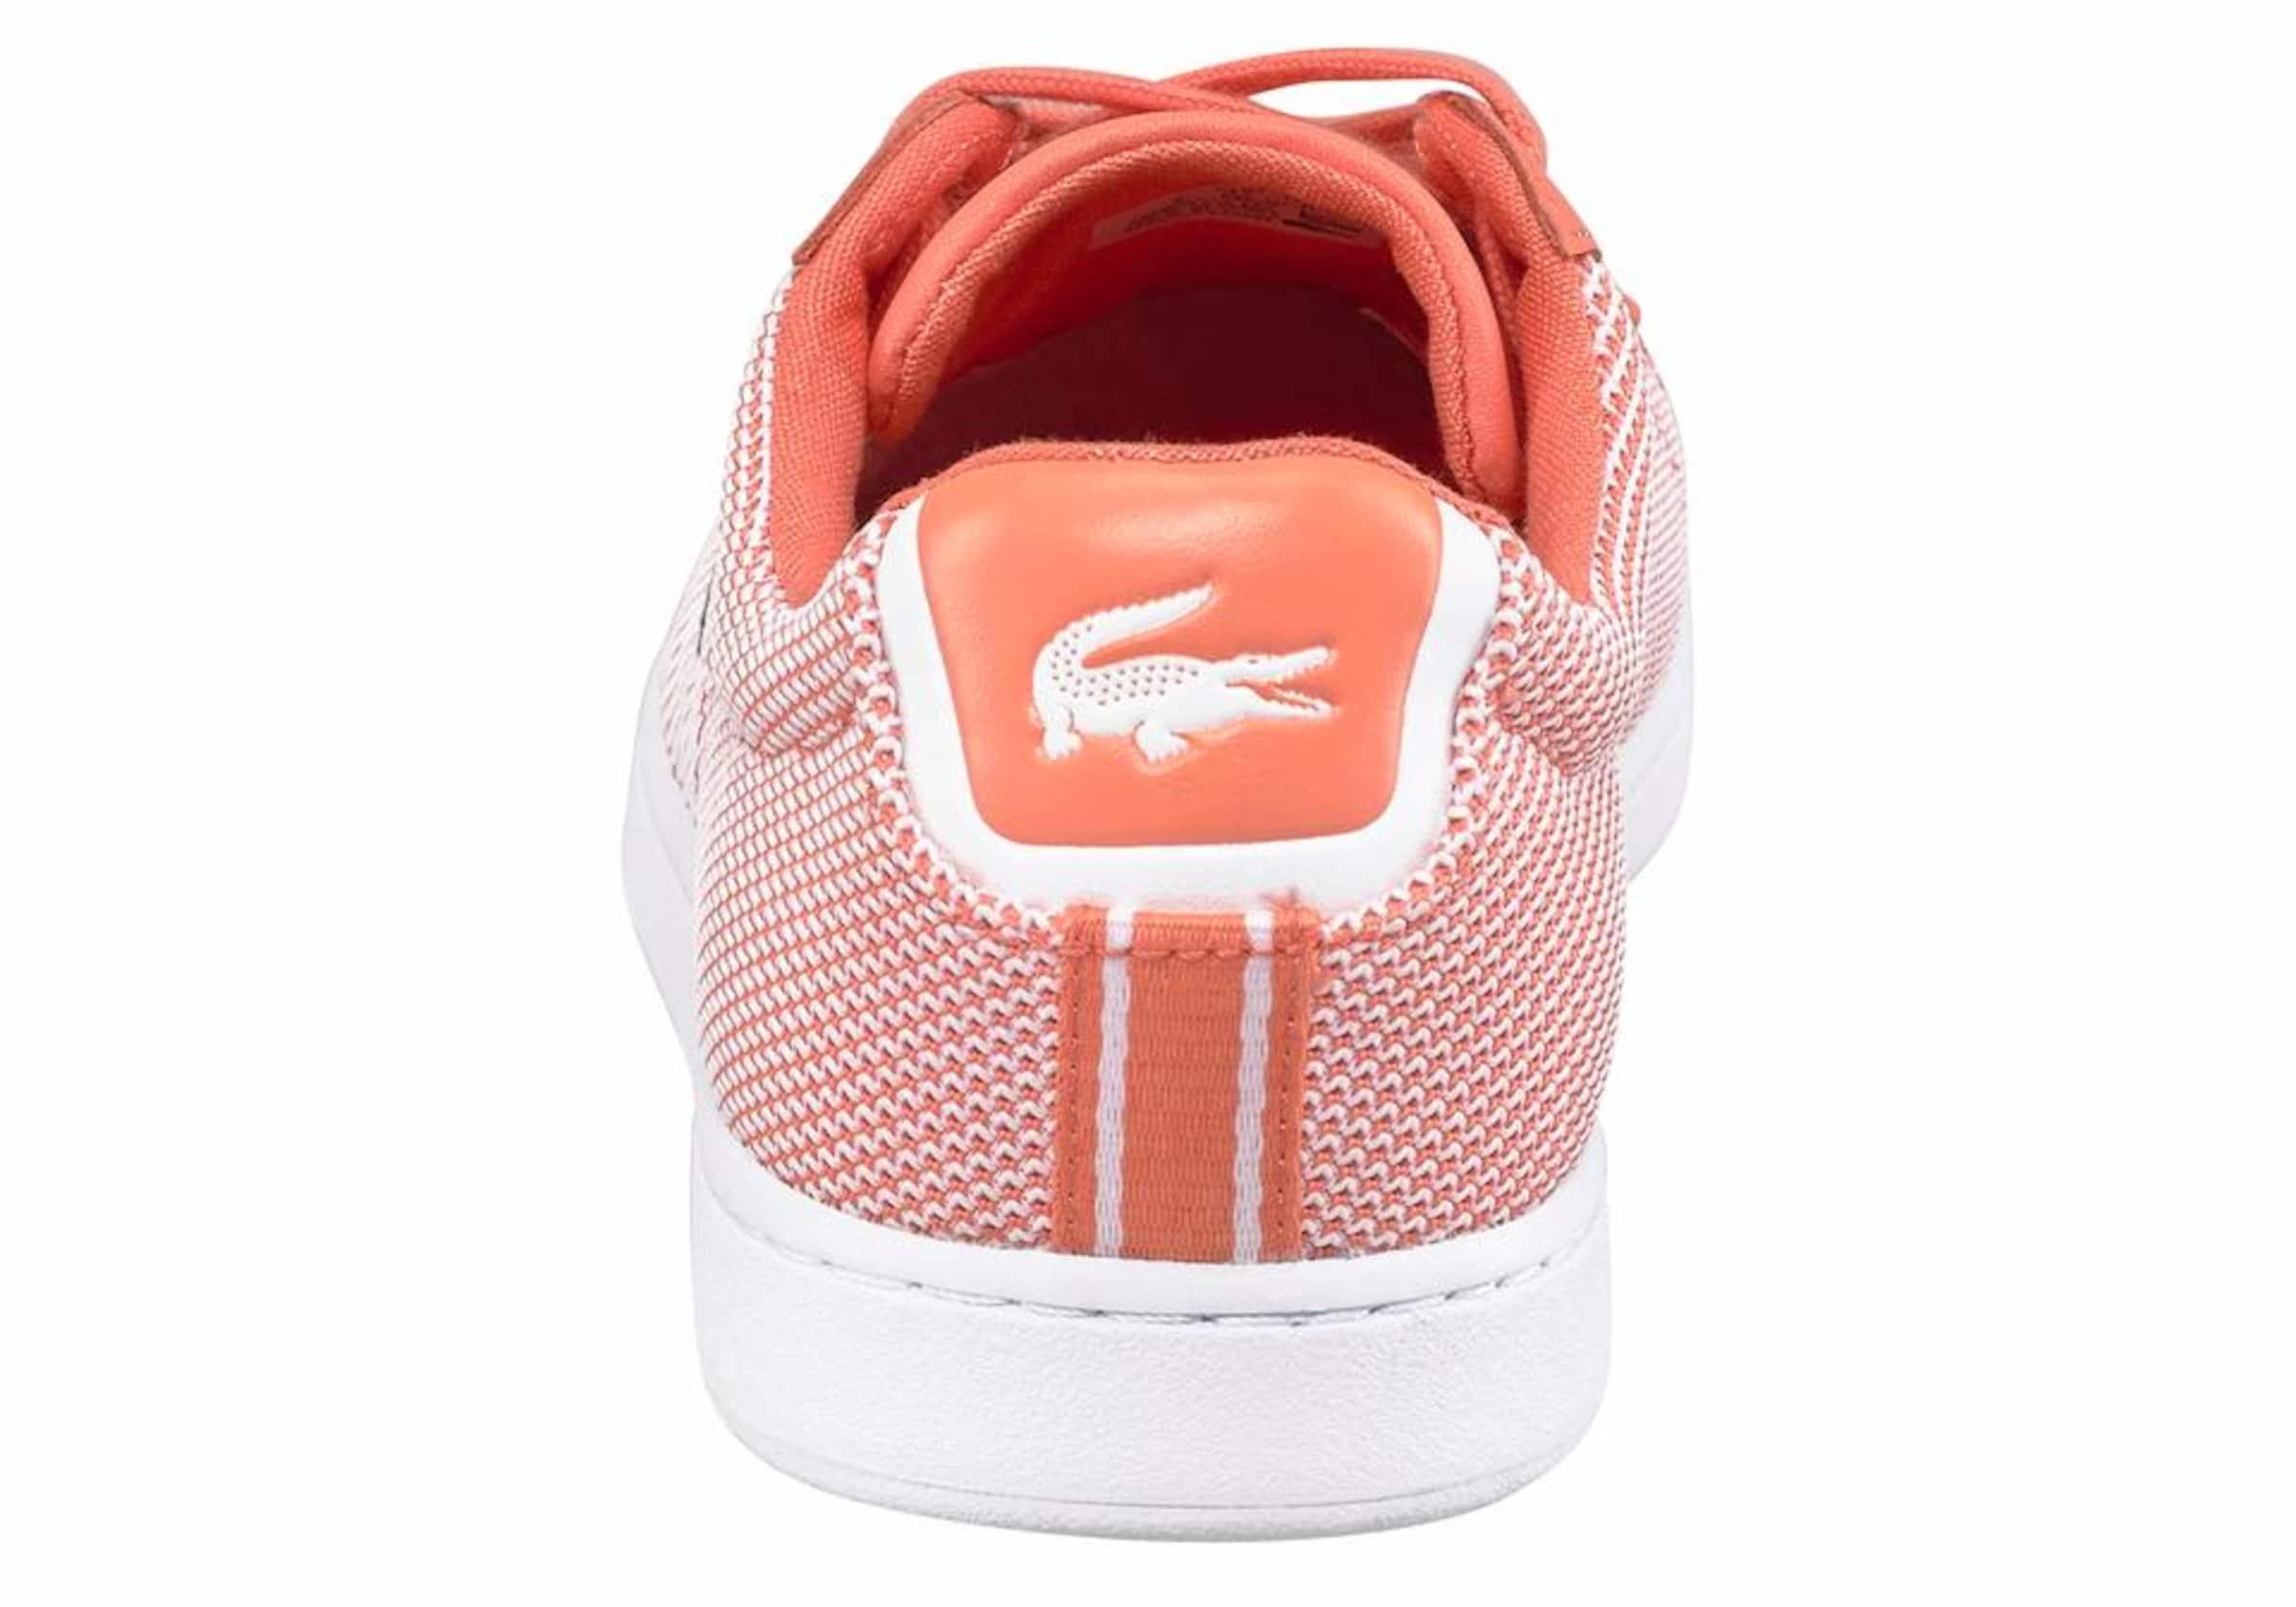 LACOSTE Sneaker 'Carnaby Evo' Verkauf Zum Verkauf 9jkjwptnL